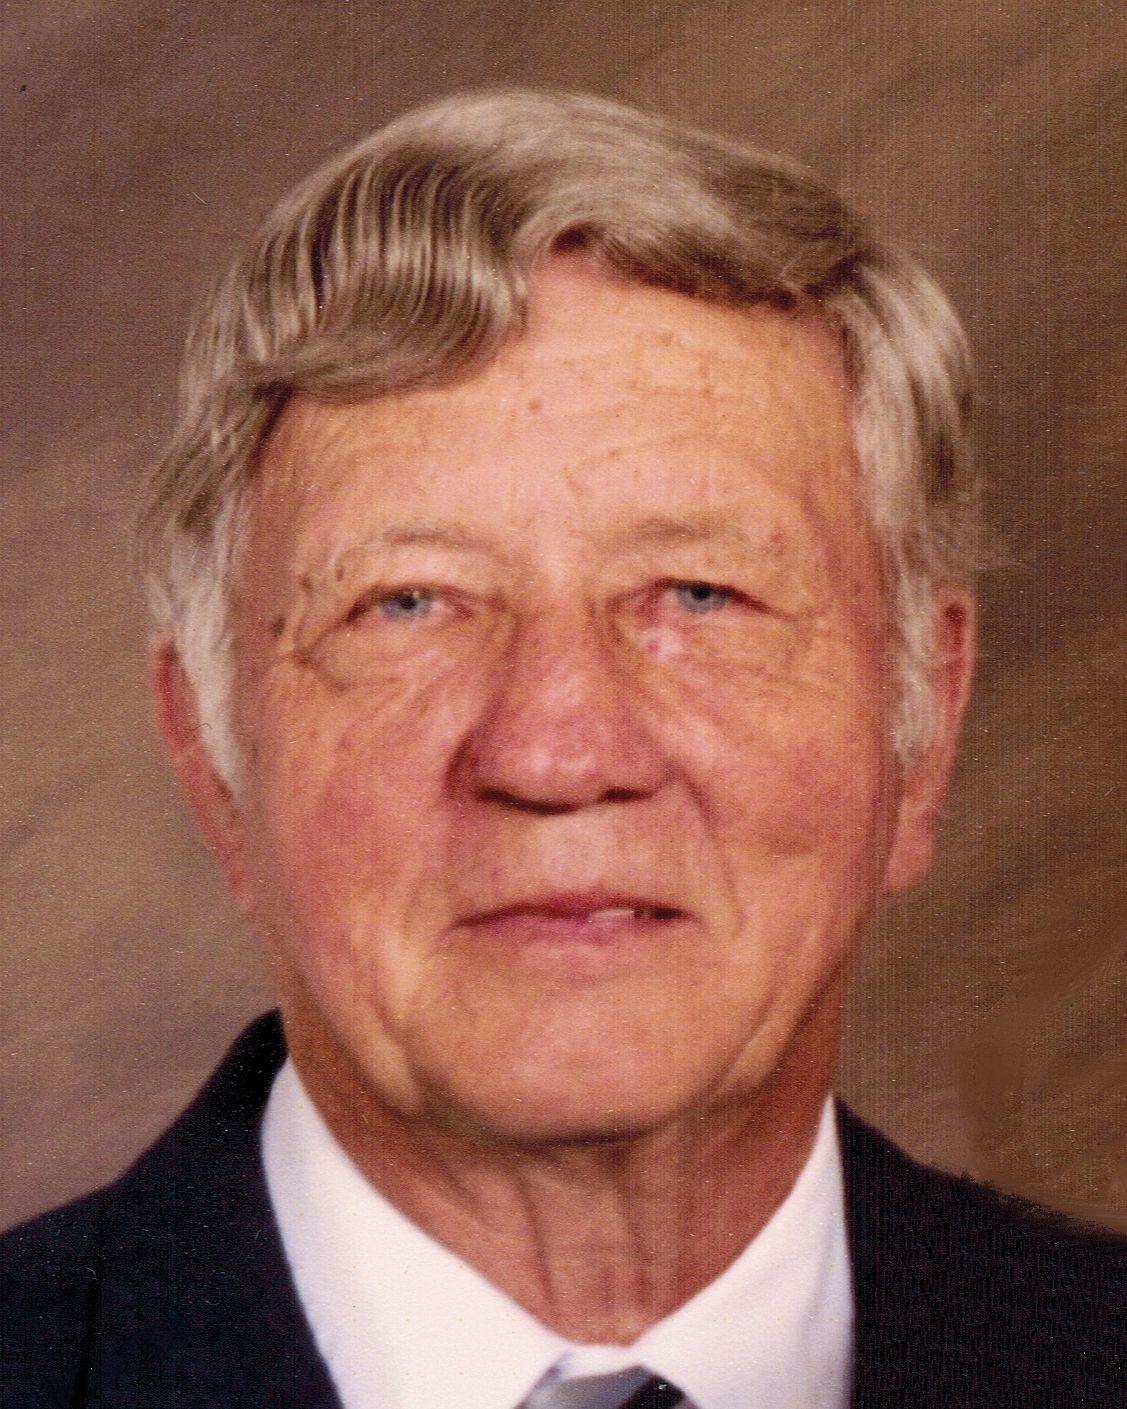 Portrait of Robert E. McAlarney